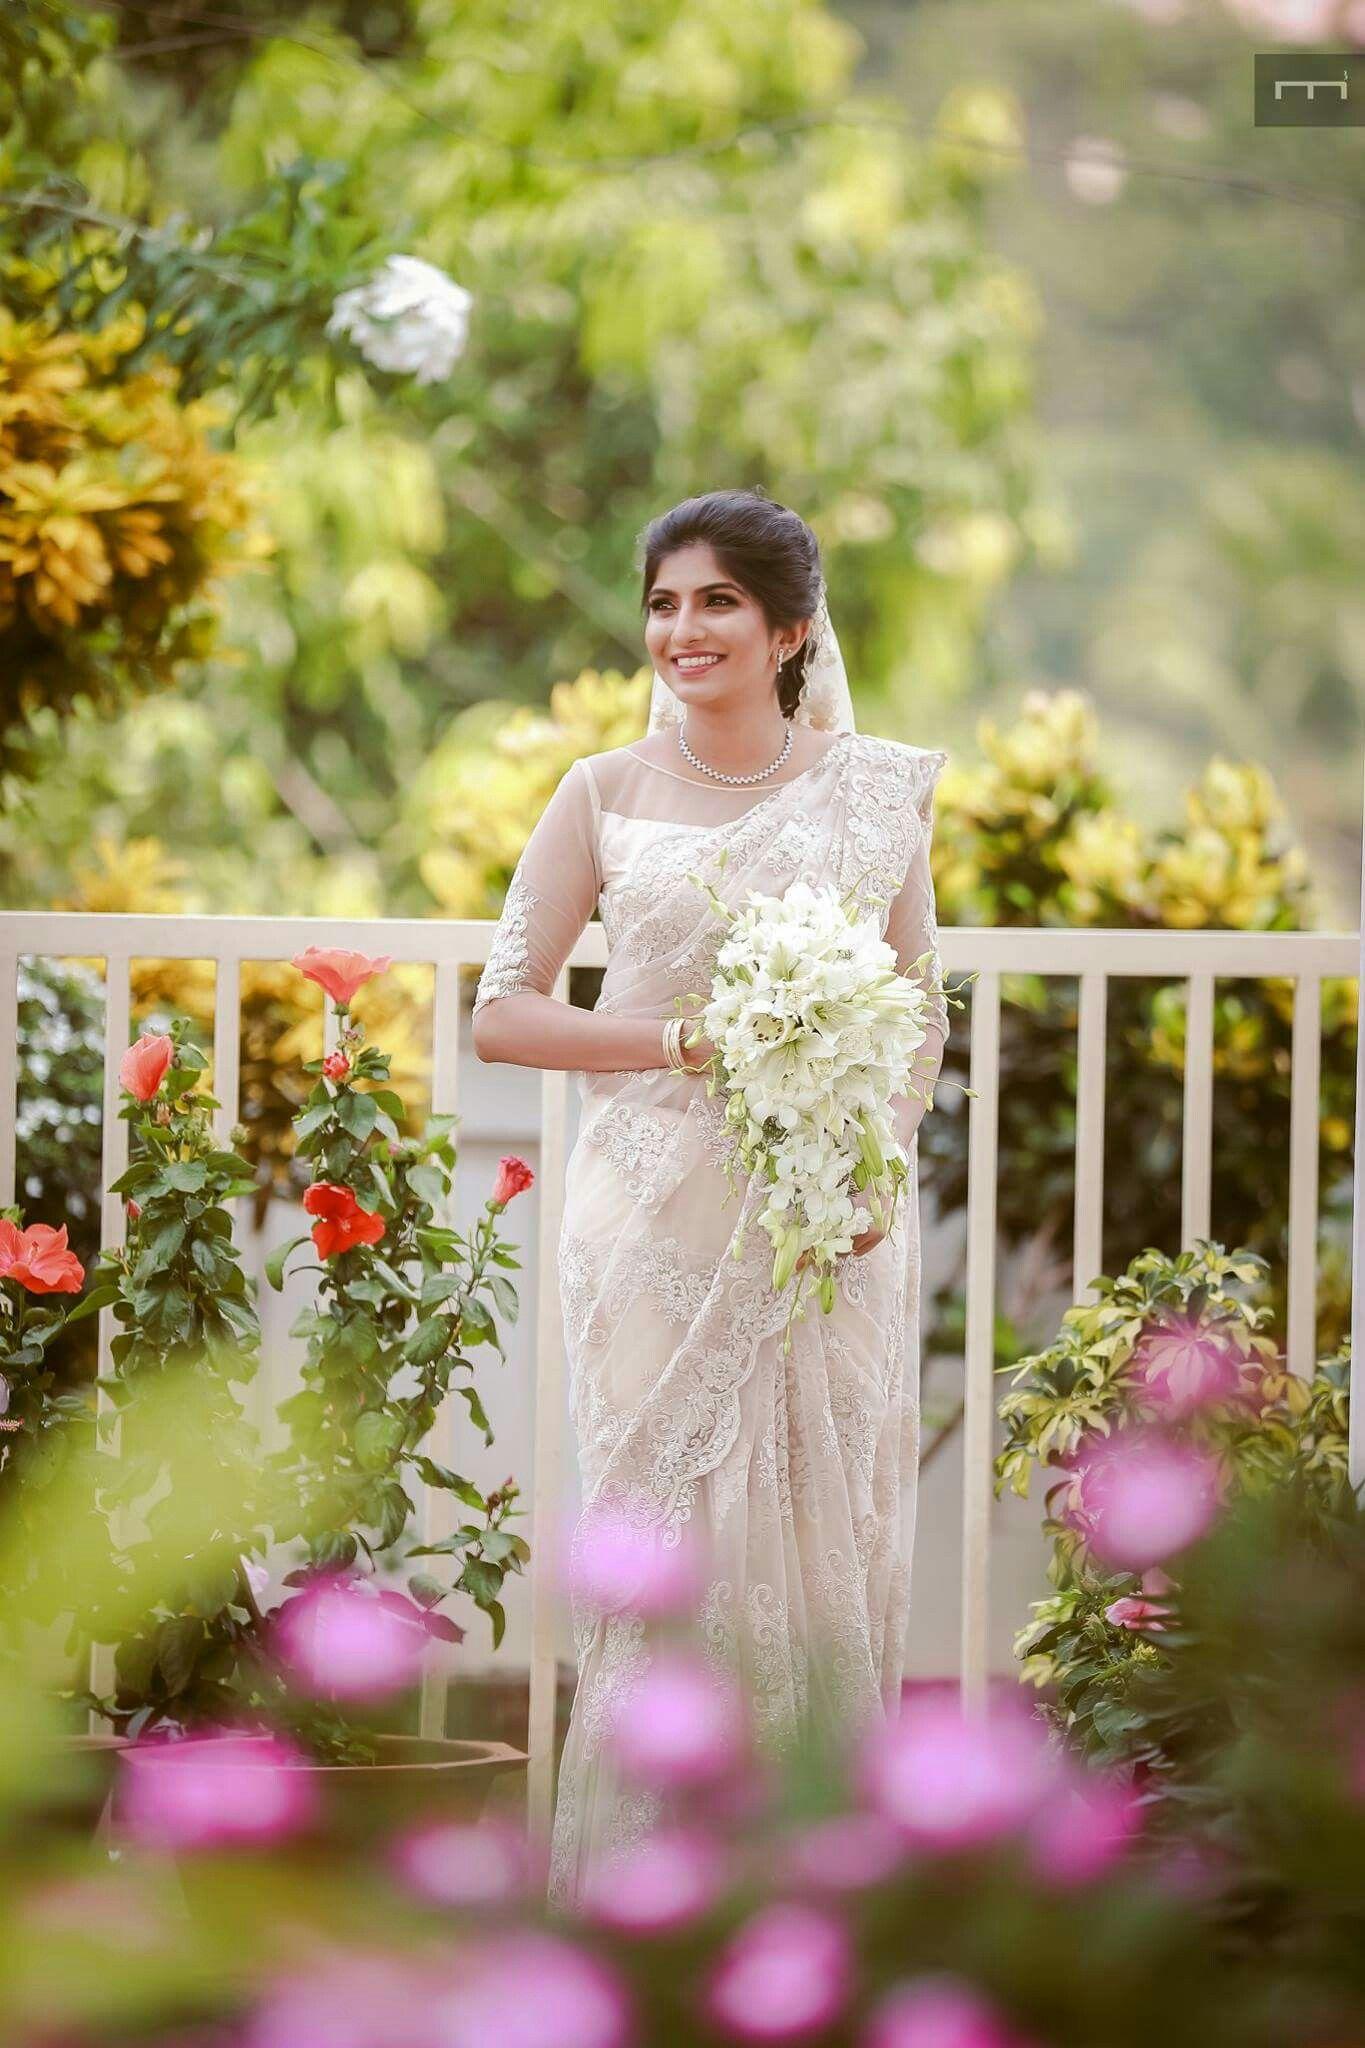 Bride Weddings Bridal Sarees Wedding Indian Photography Ideas Preparation